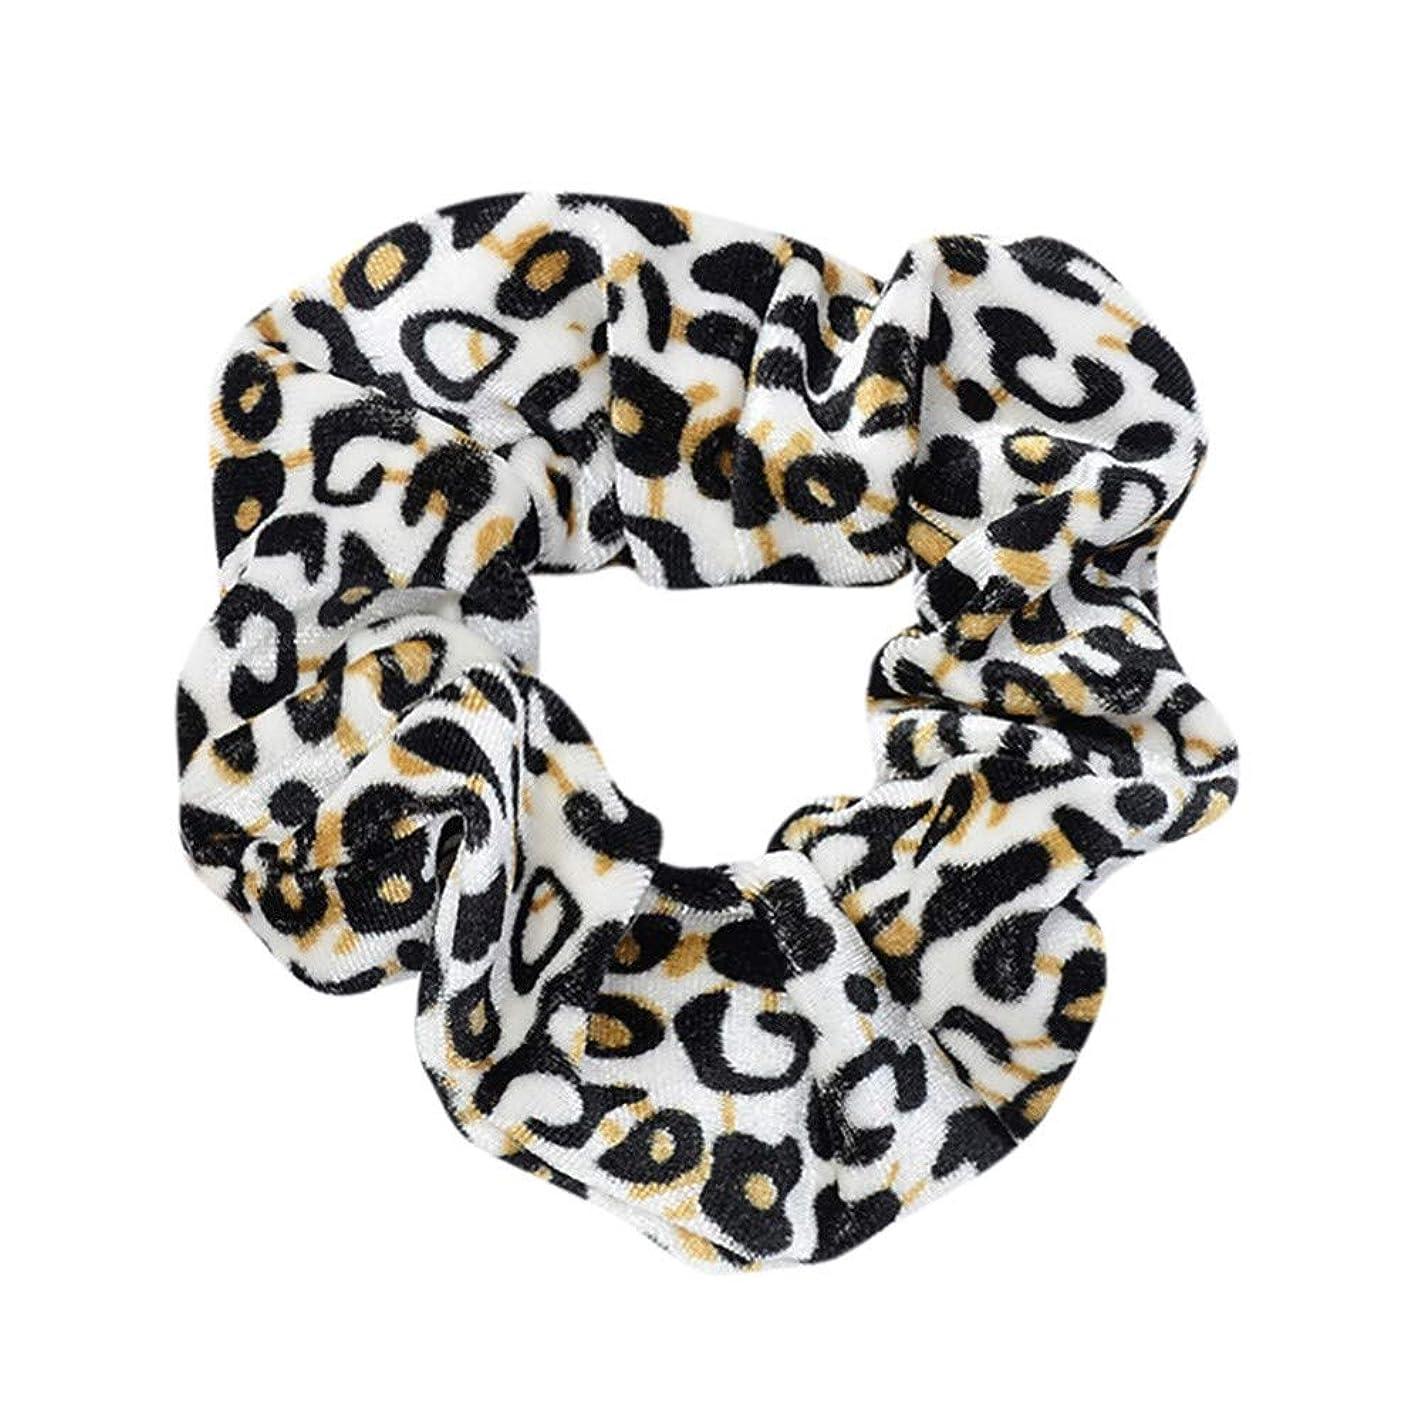 AOJIAN Accessories Women Headband Elastic Leopard Ponytail Scrunchie 5 in 1 Headwrap Hair Band